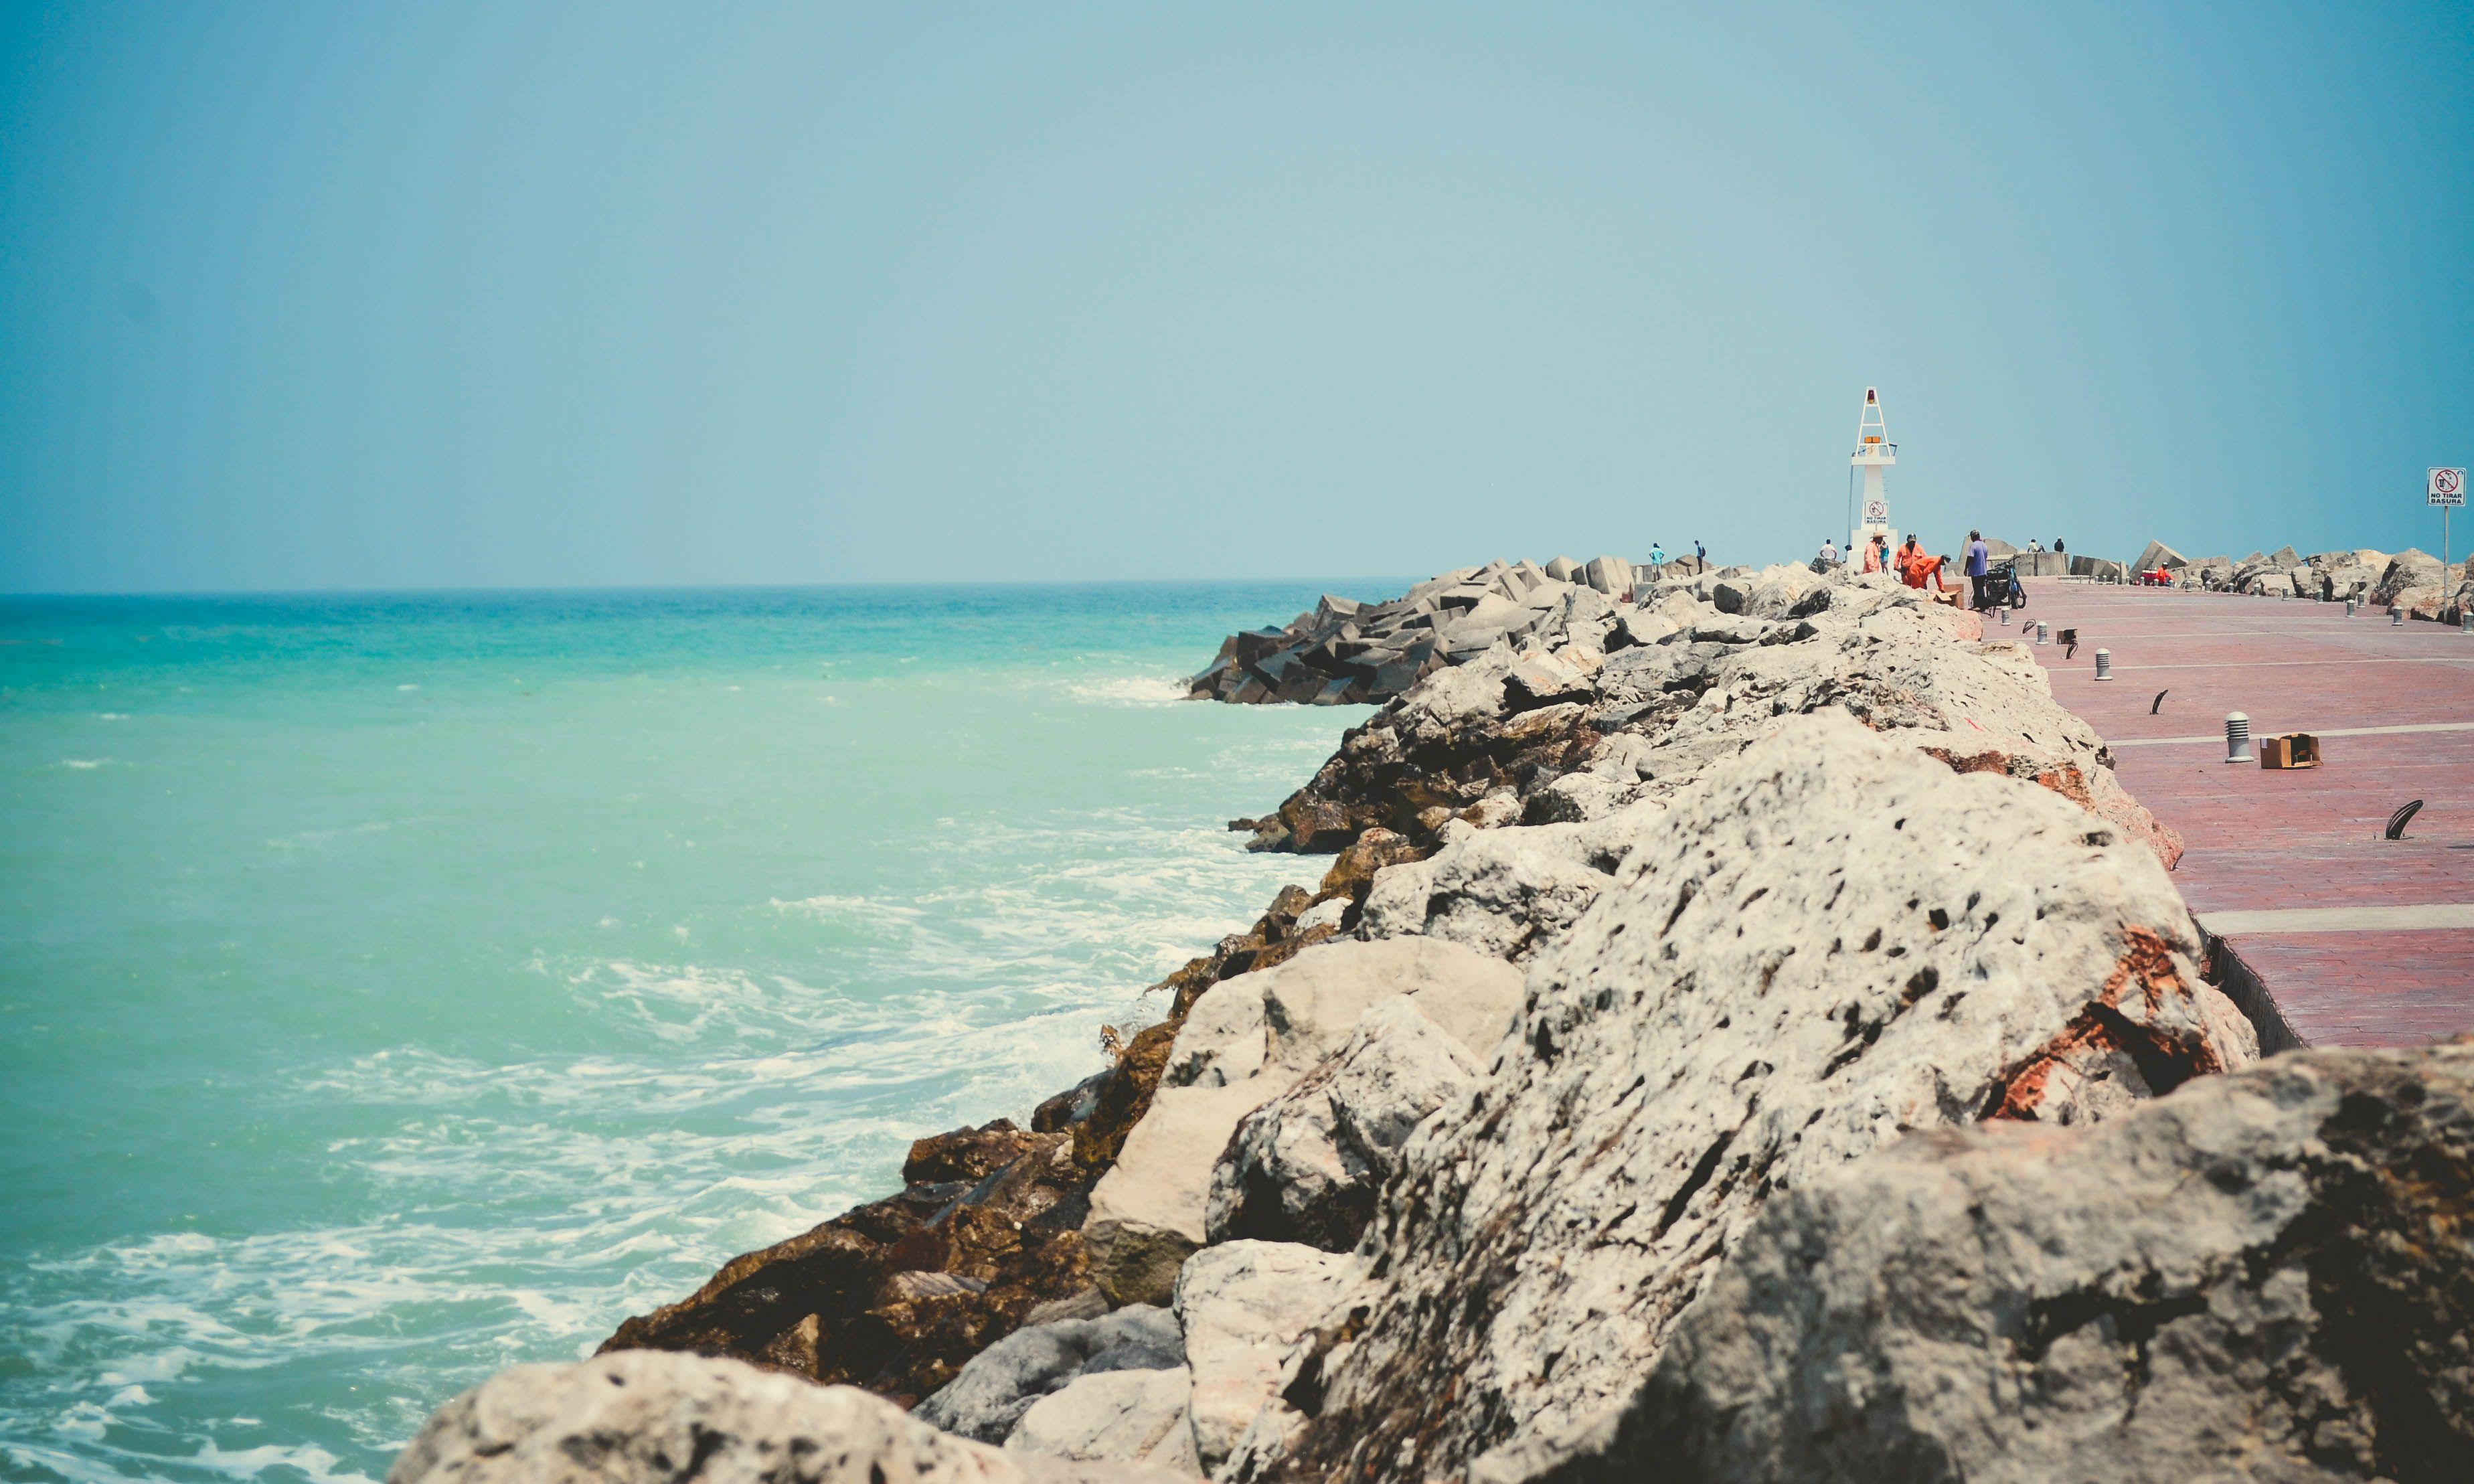 Playa Miramar Tampico Tamaulipas Mexico Lugares Mexico Playa Fotografia